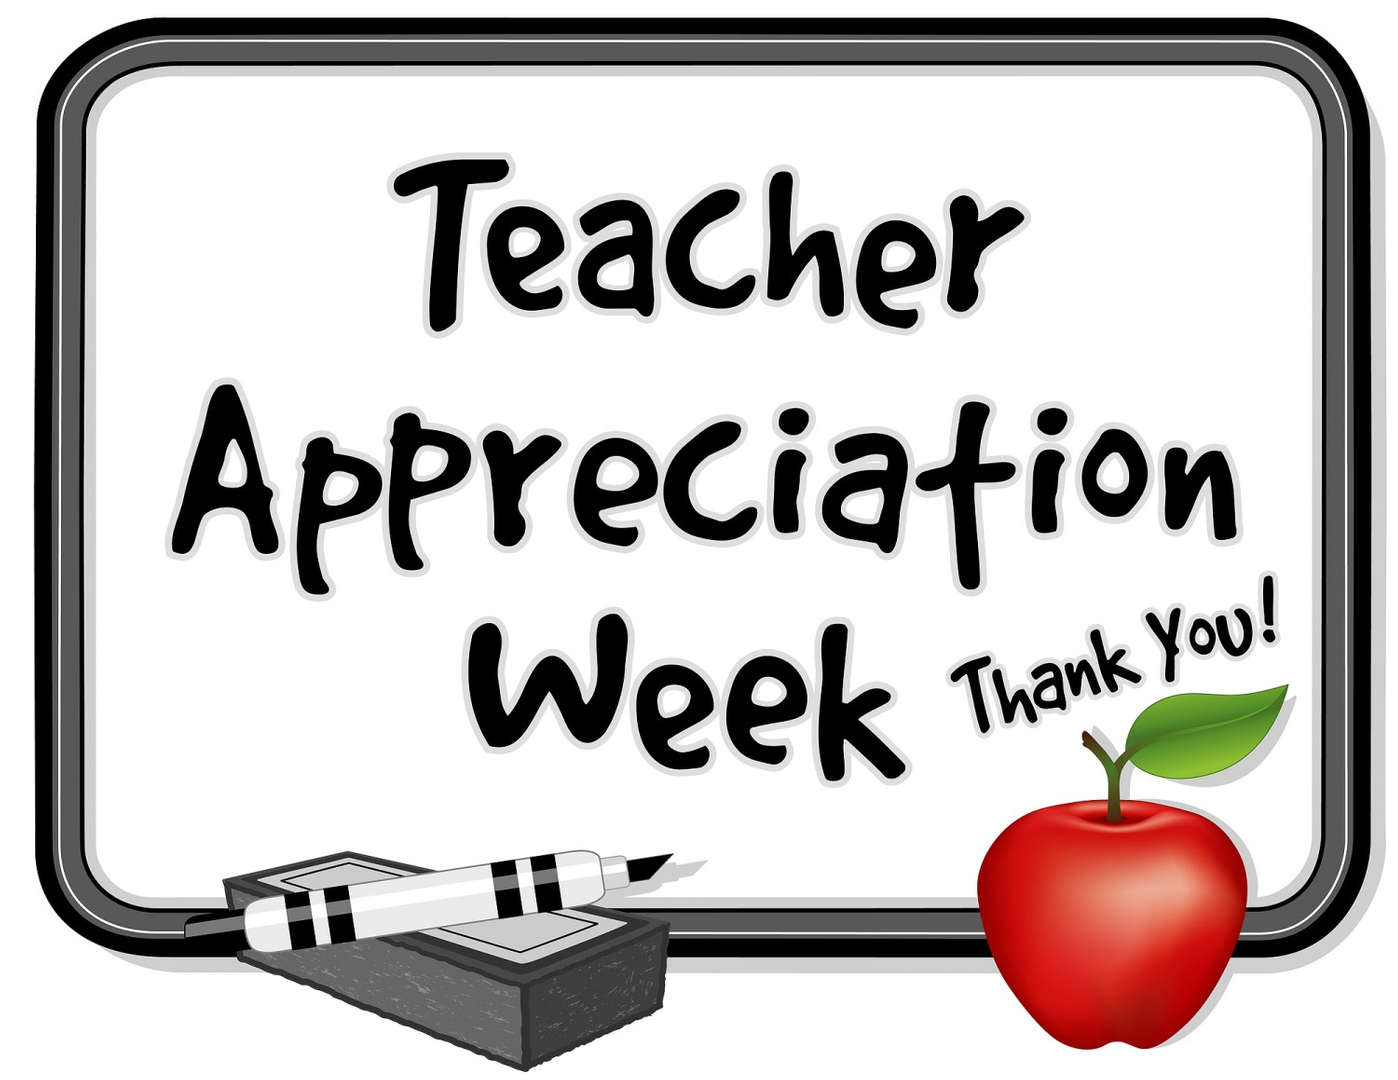 Teacher Appreciate Week, Thank you!